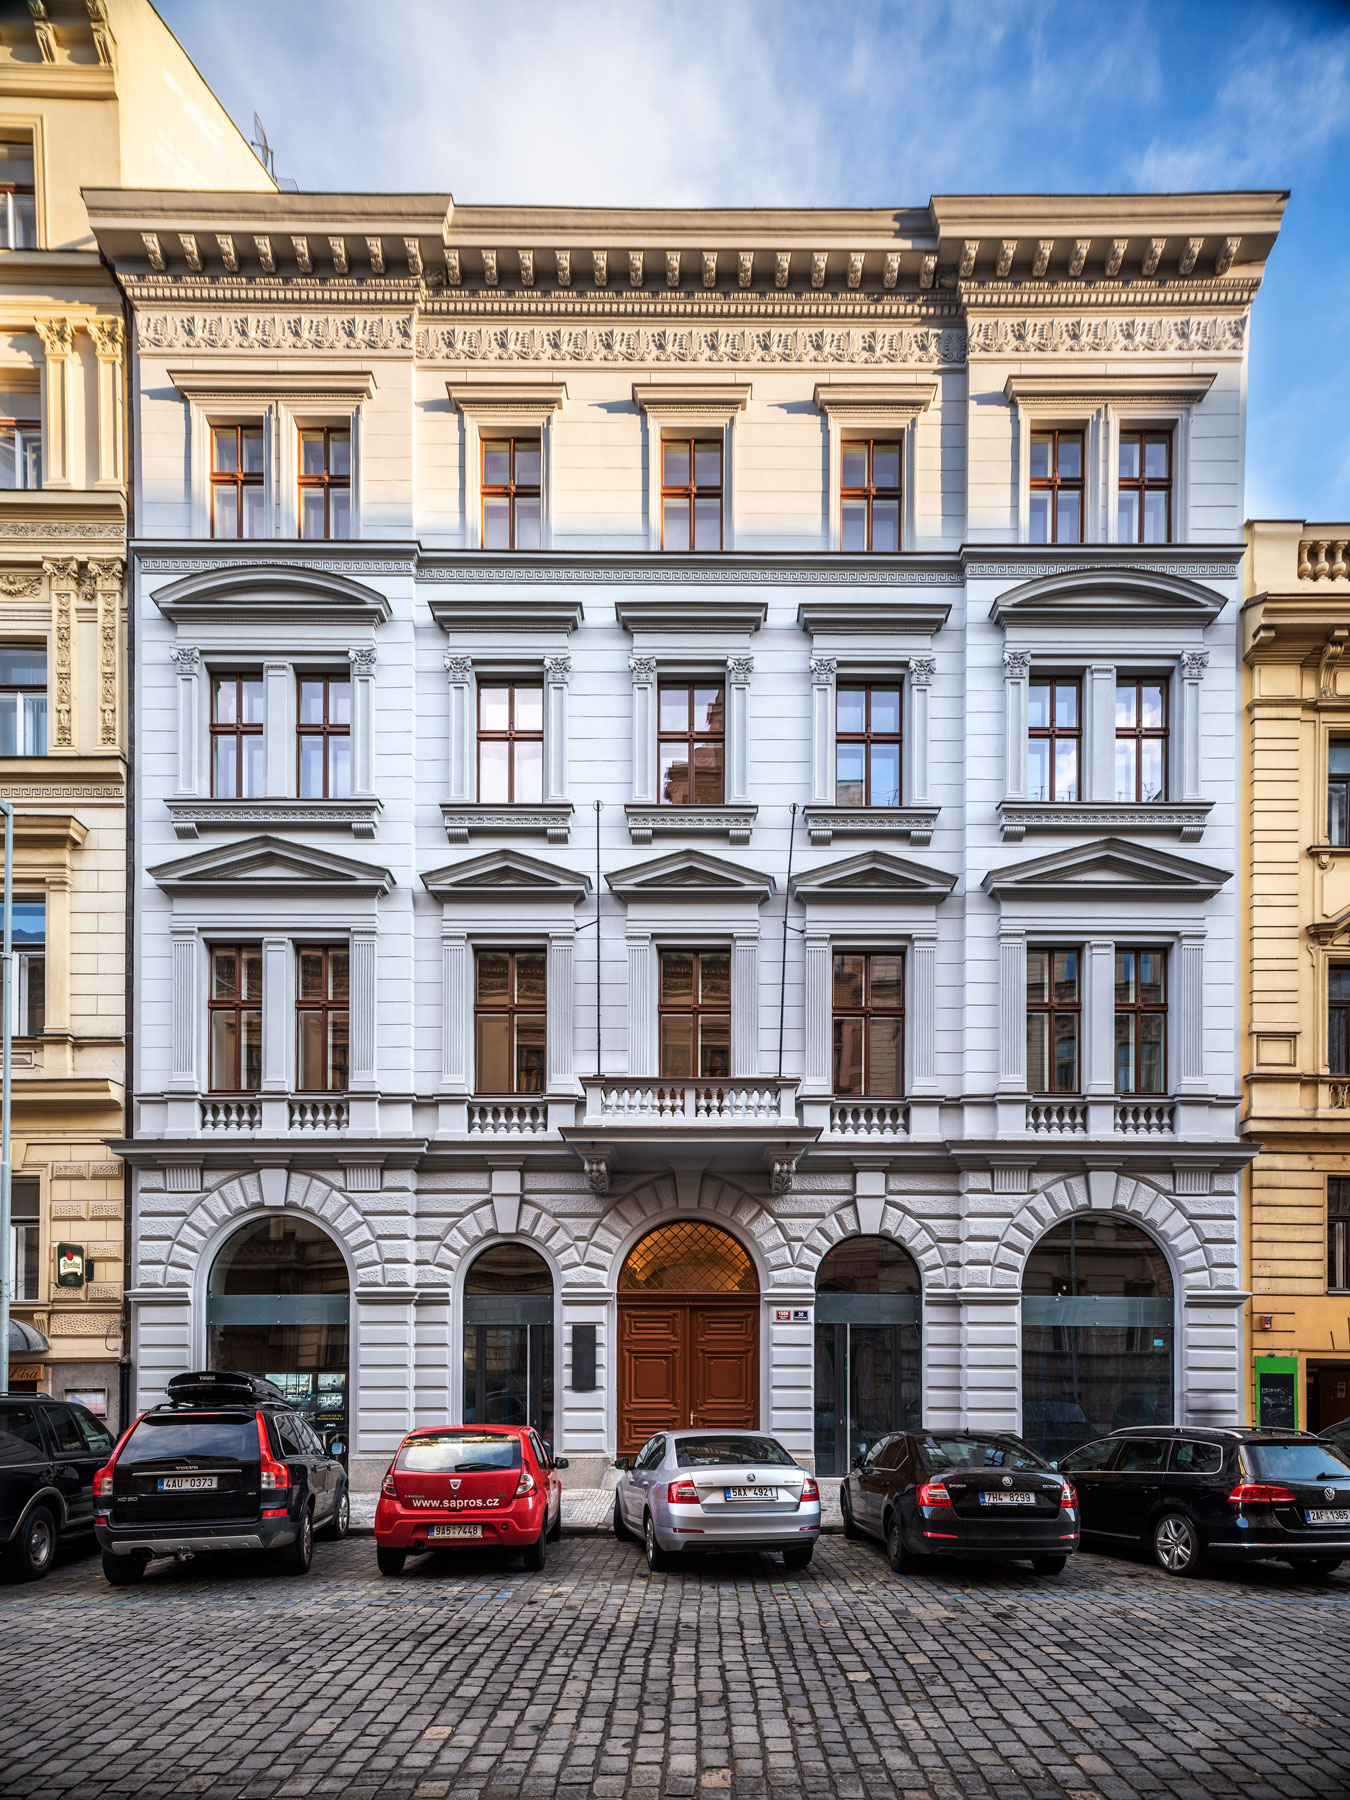 Rezidence Opletalova: Historický dům s mladistvým elánem